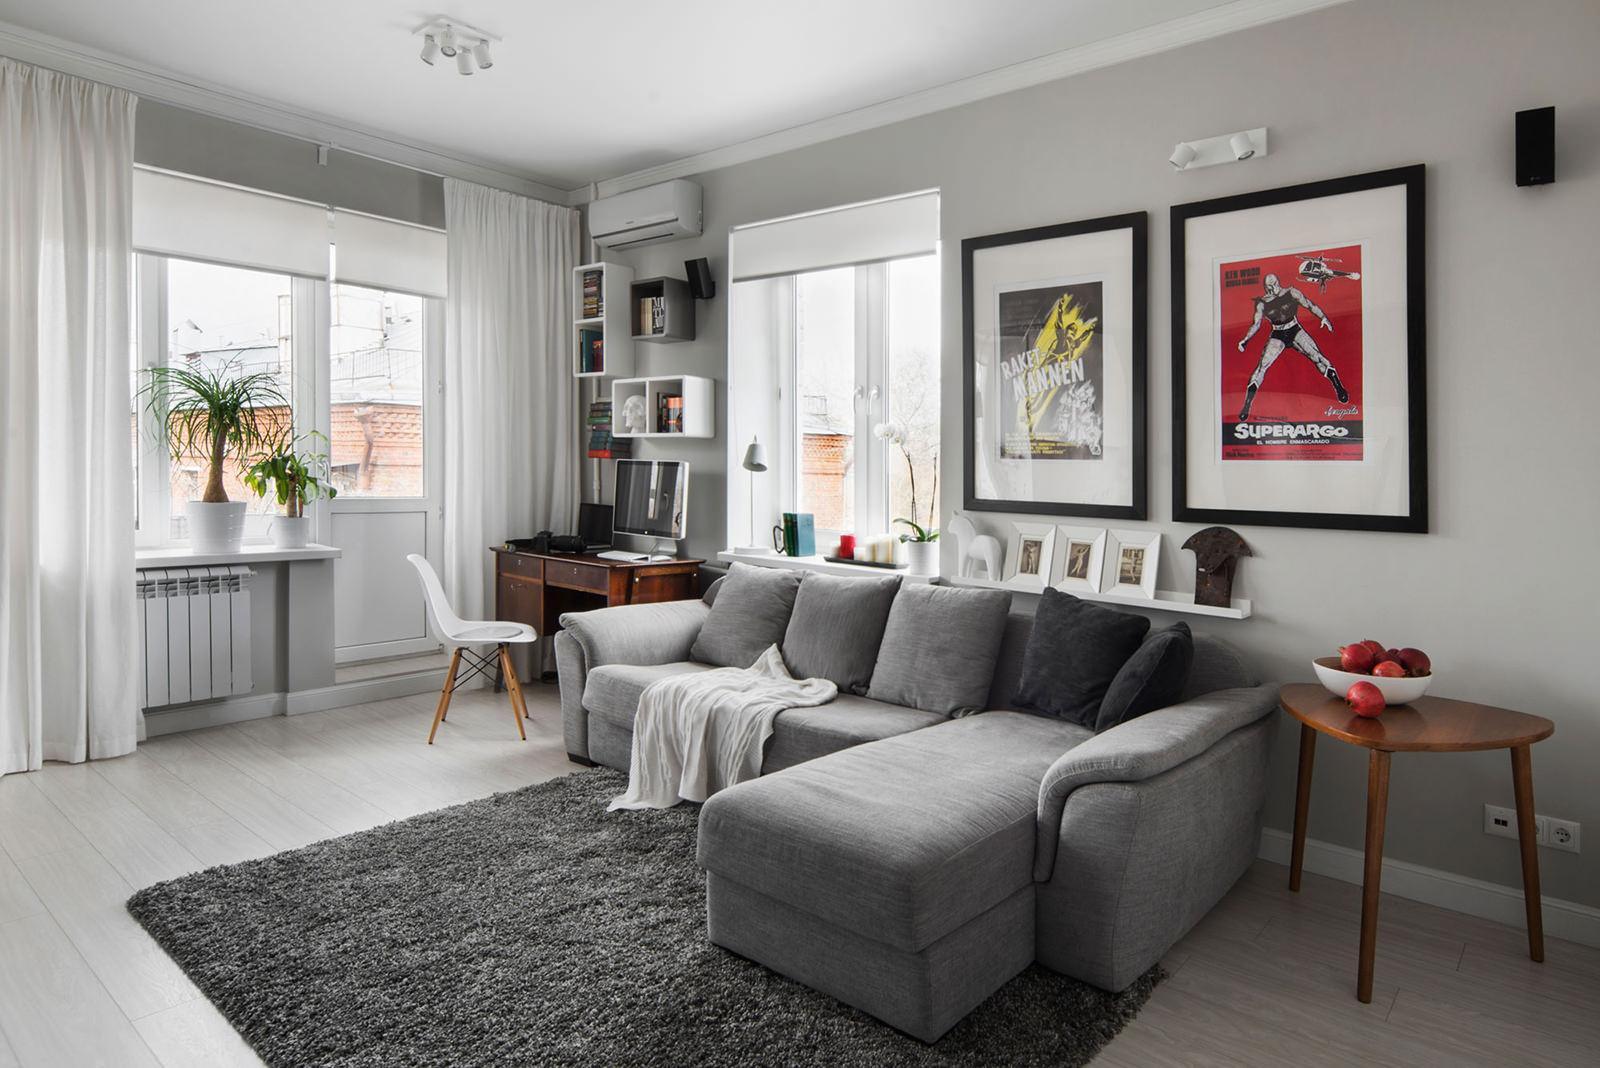 дизайн малогабаритных квартир фото хрущевка